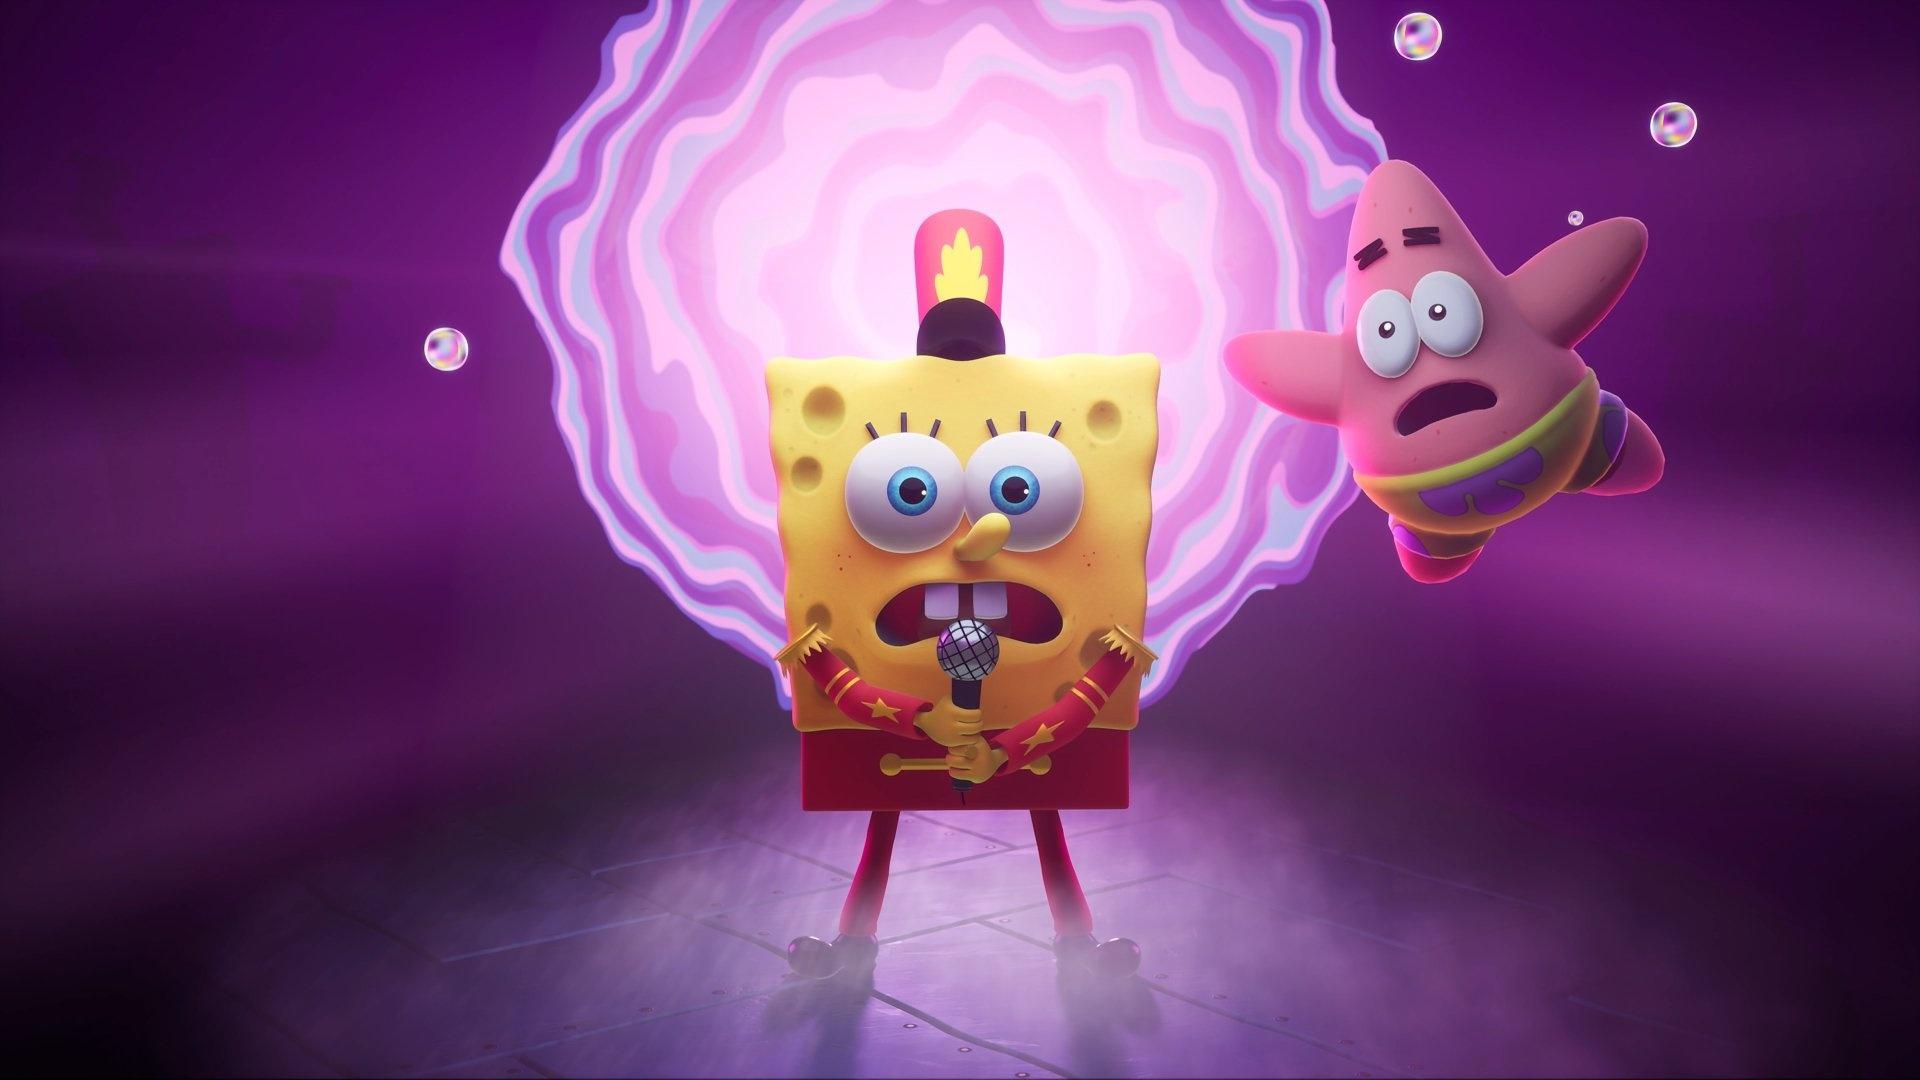 Sponge pc wallpaper